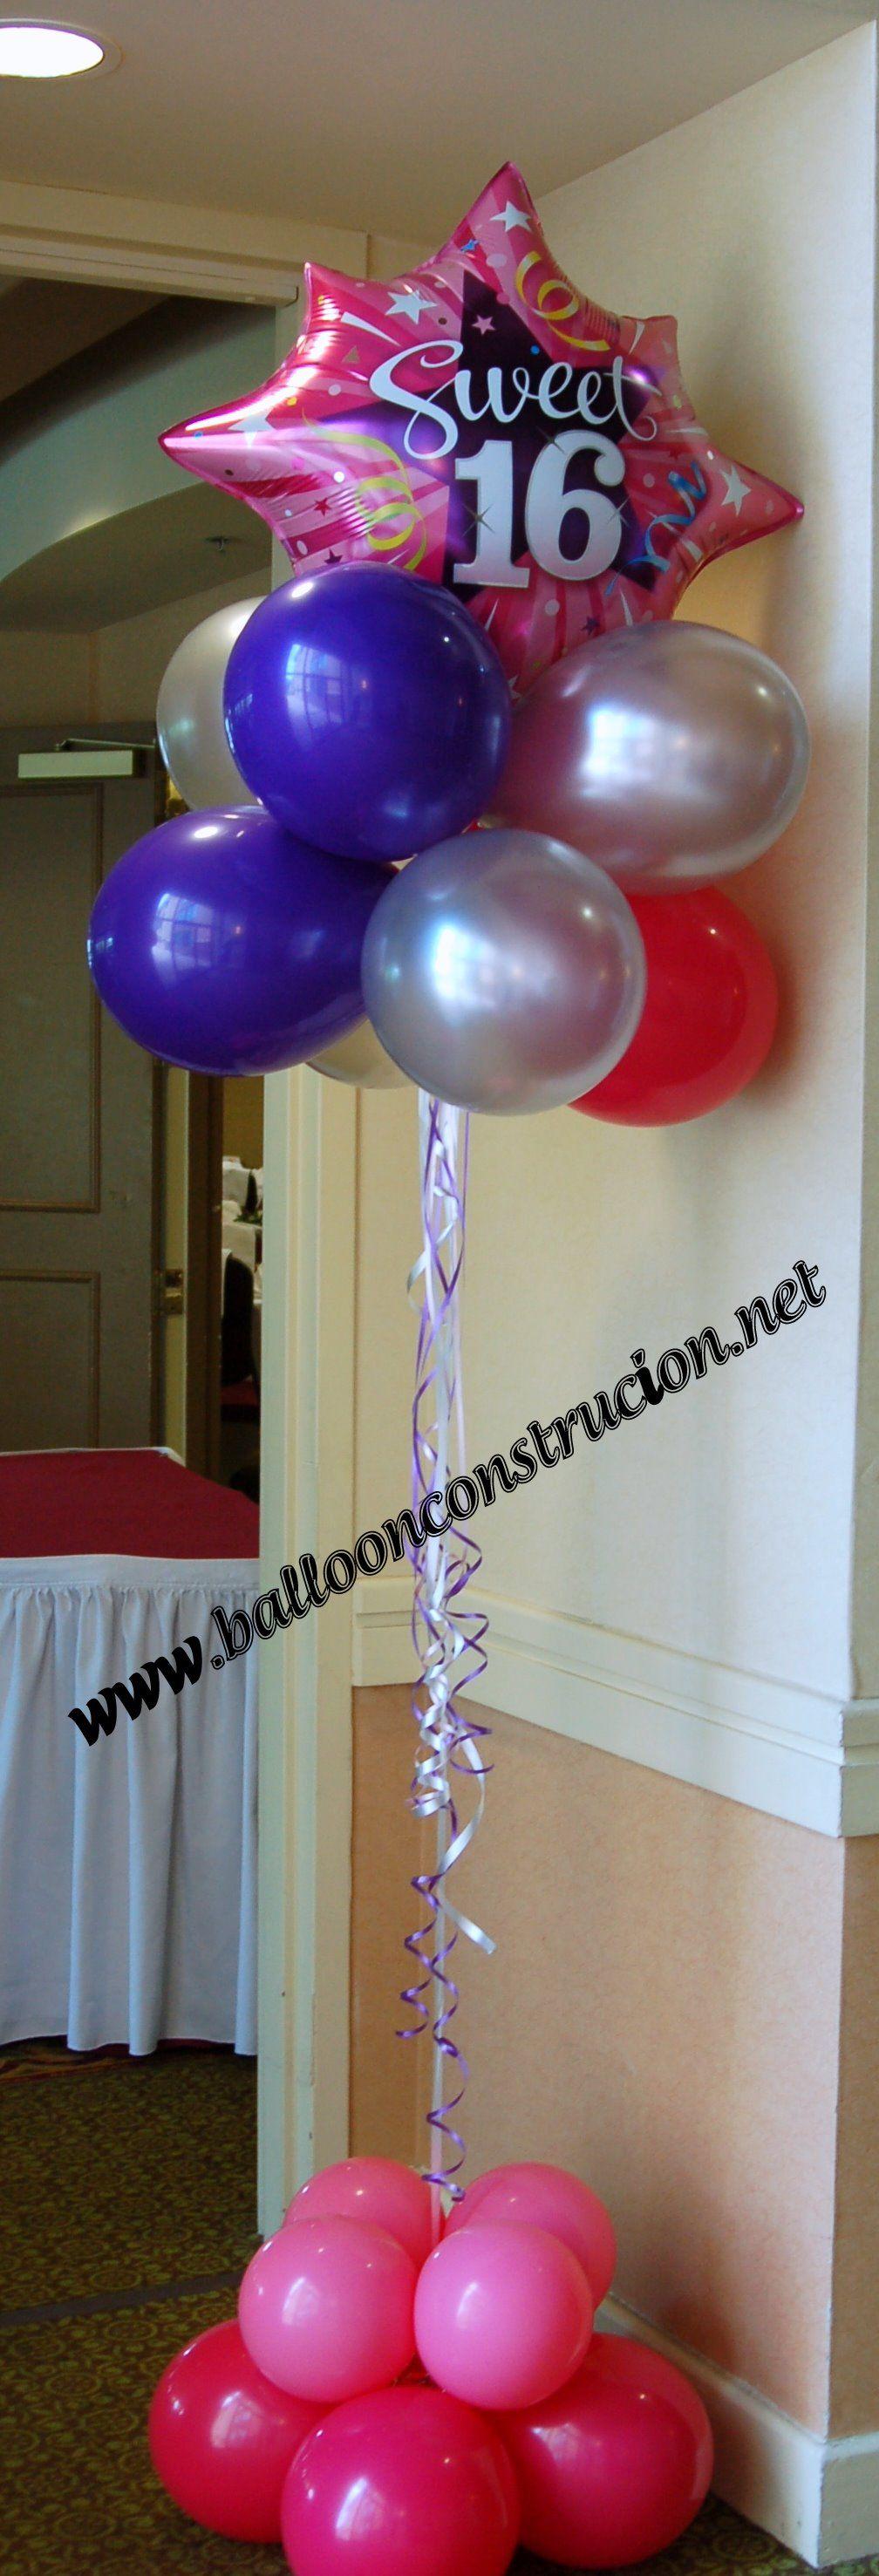 Sweet 16 room decor! | Sweet 16 decorations, Sweet 16 ...